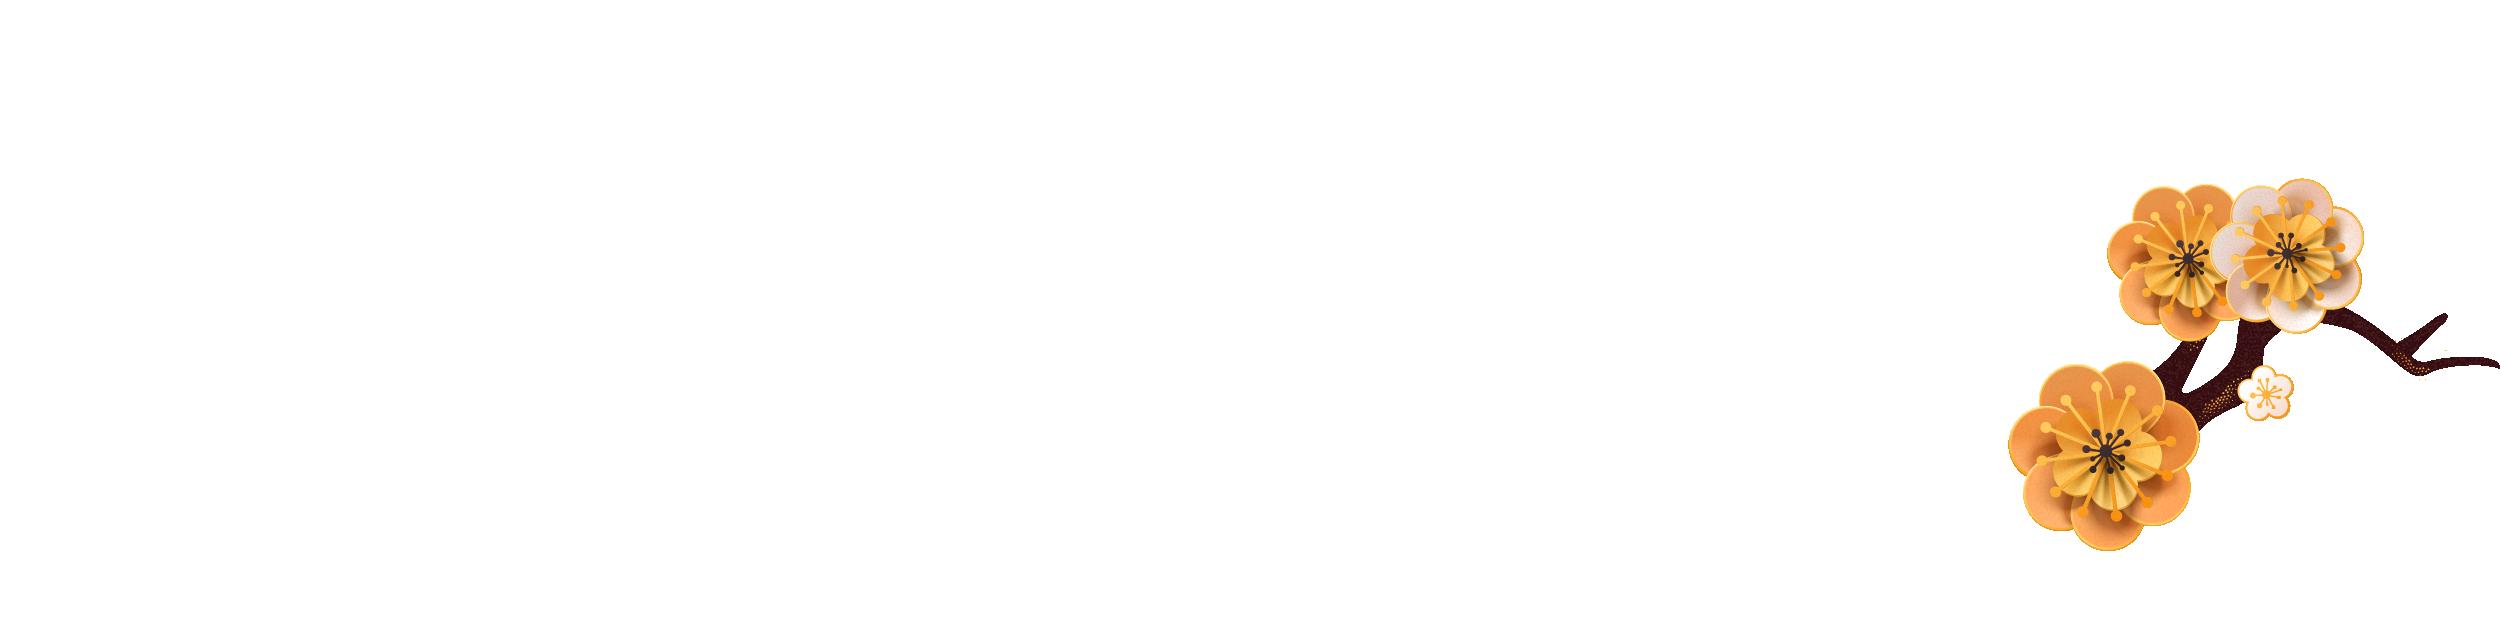 VNDirect